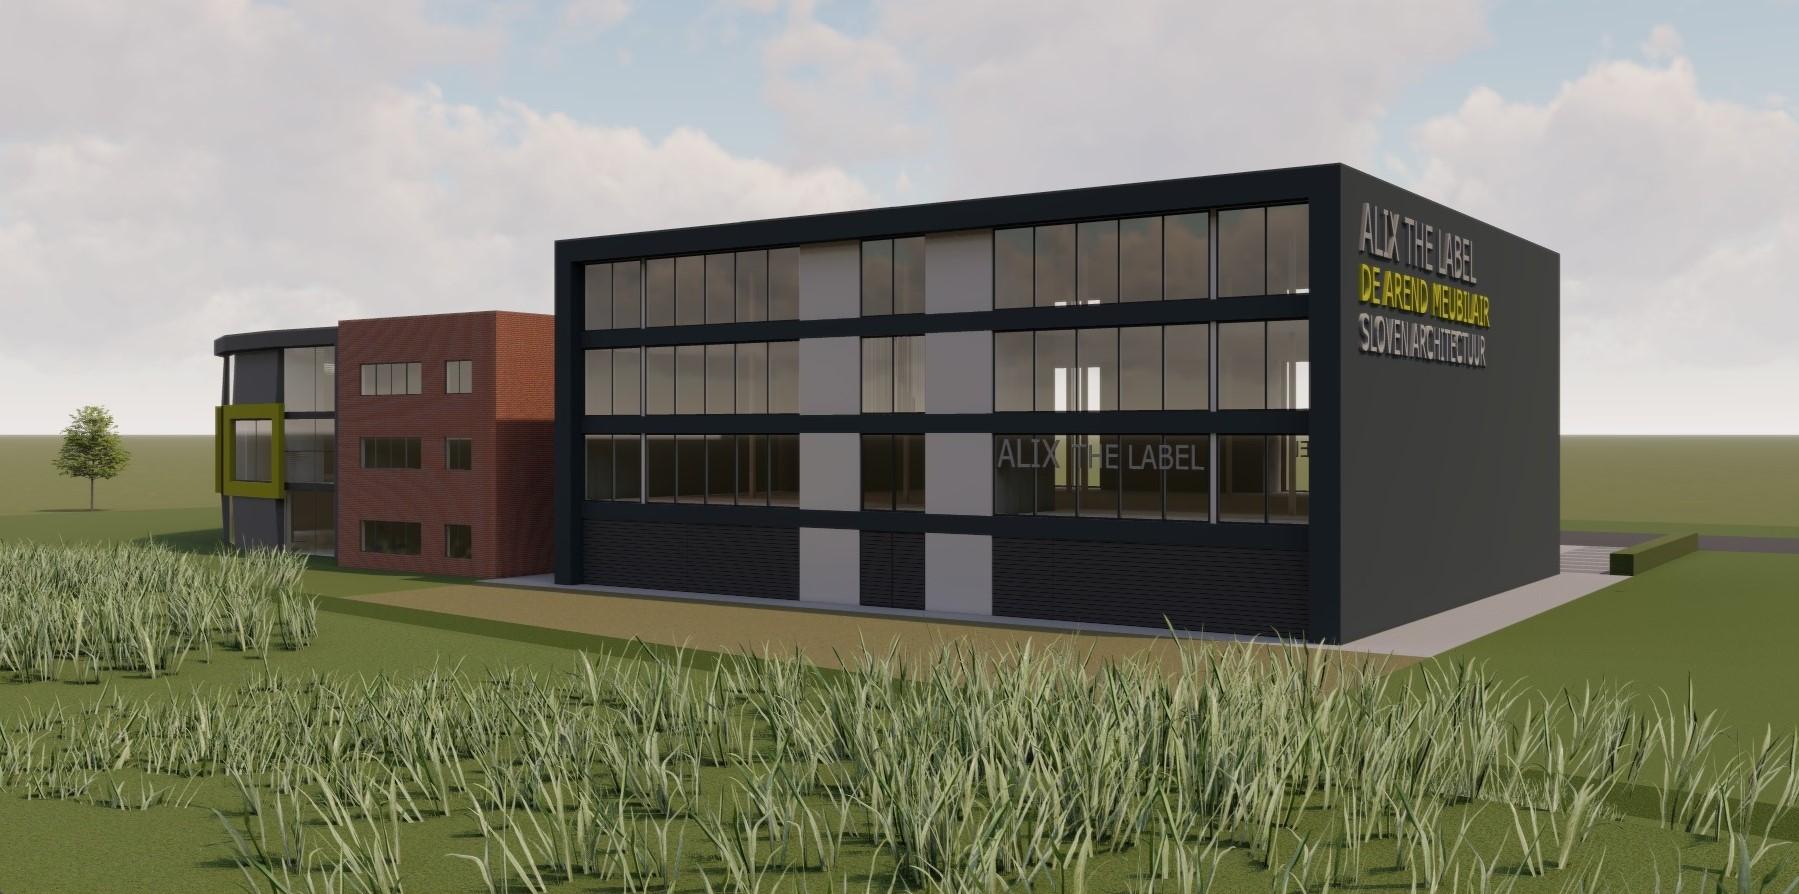 Nieuwbouw bedrijfspand Alix the label en De Arend